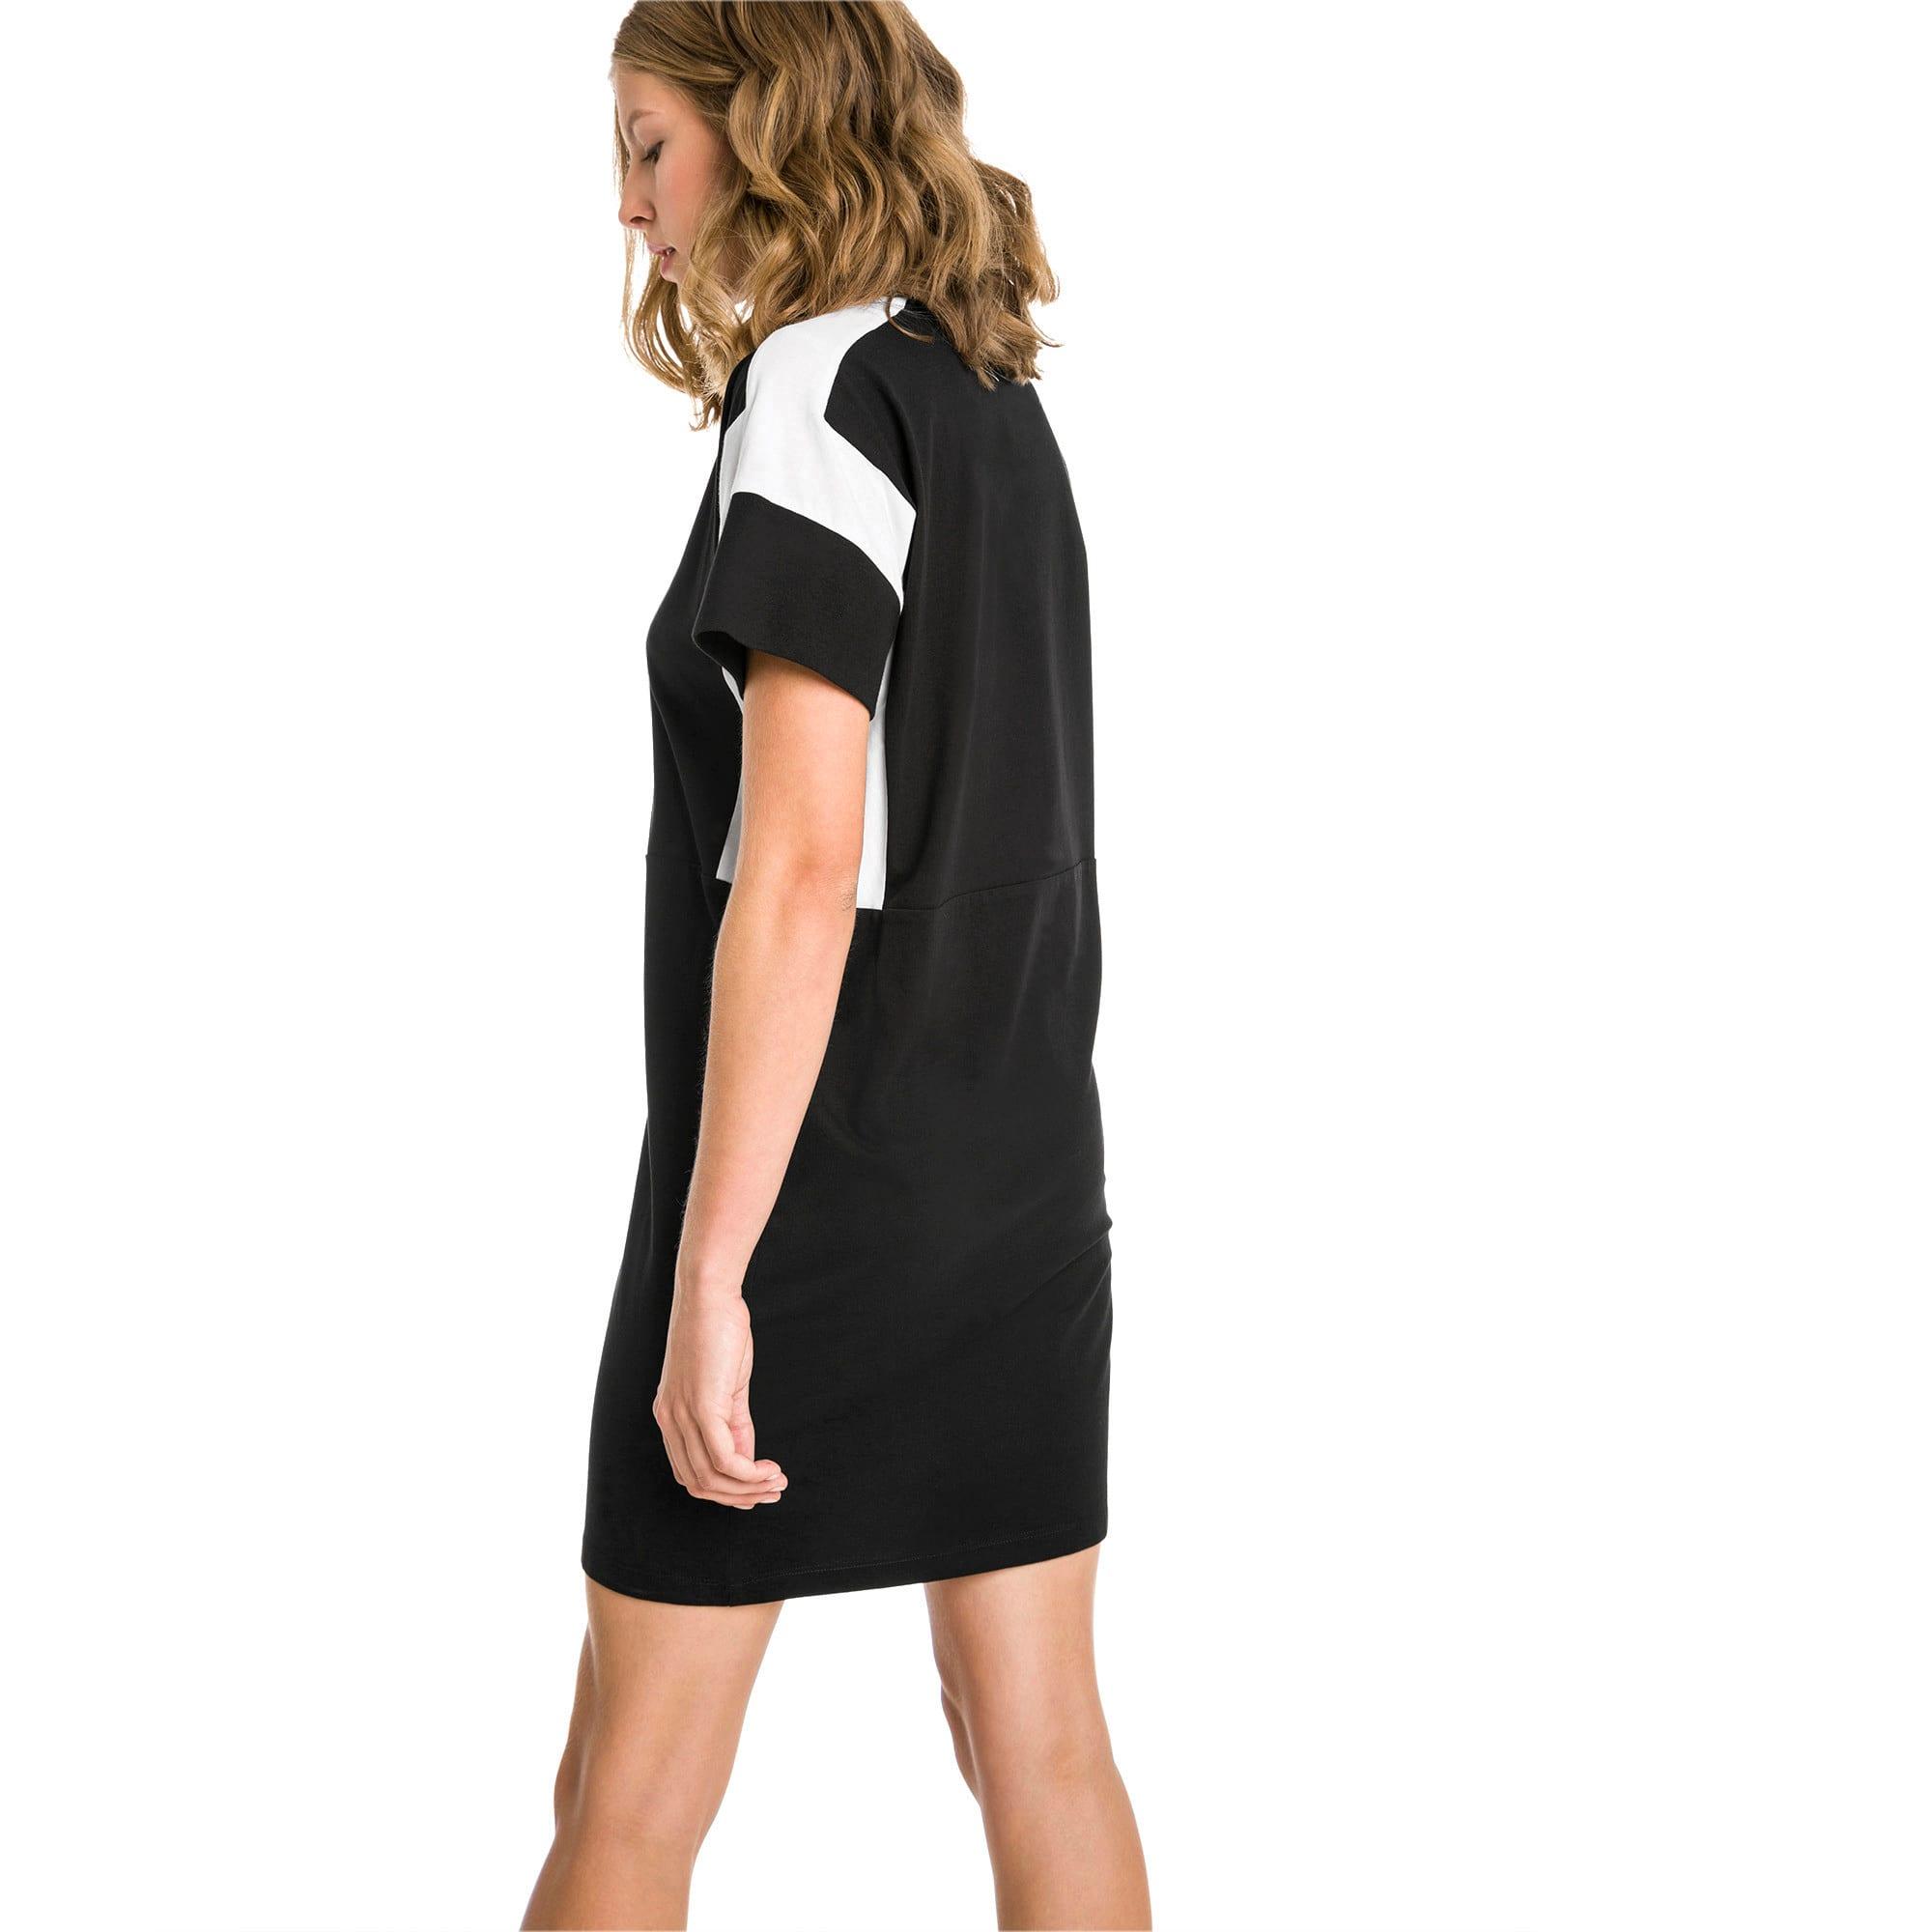 Thumbnail 3 of Chase Women's Dress, Cotton Black, medium